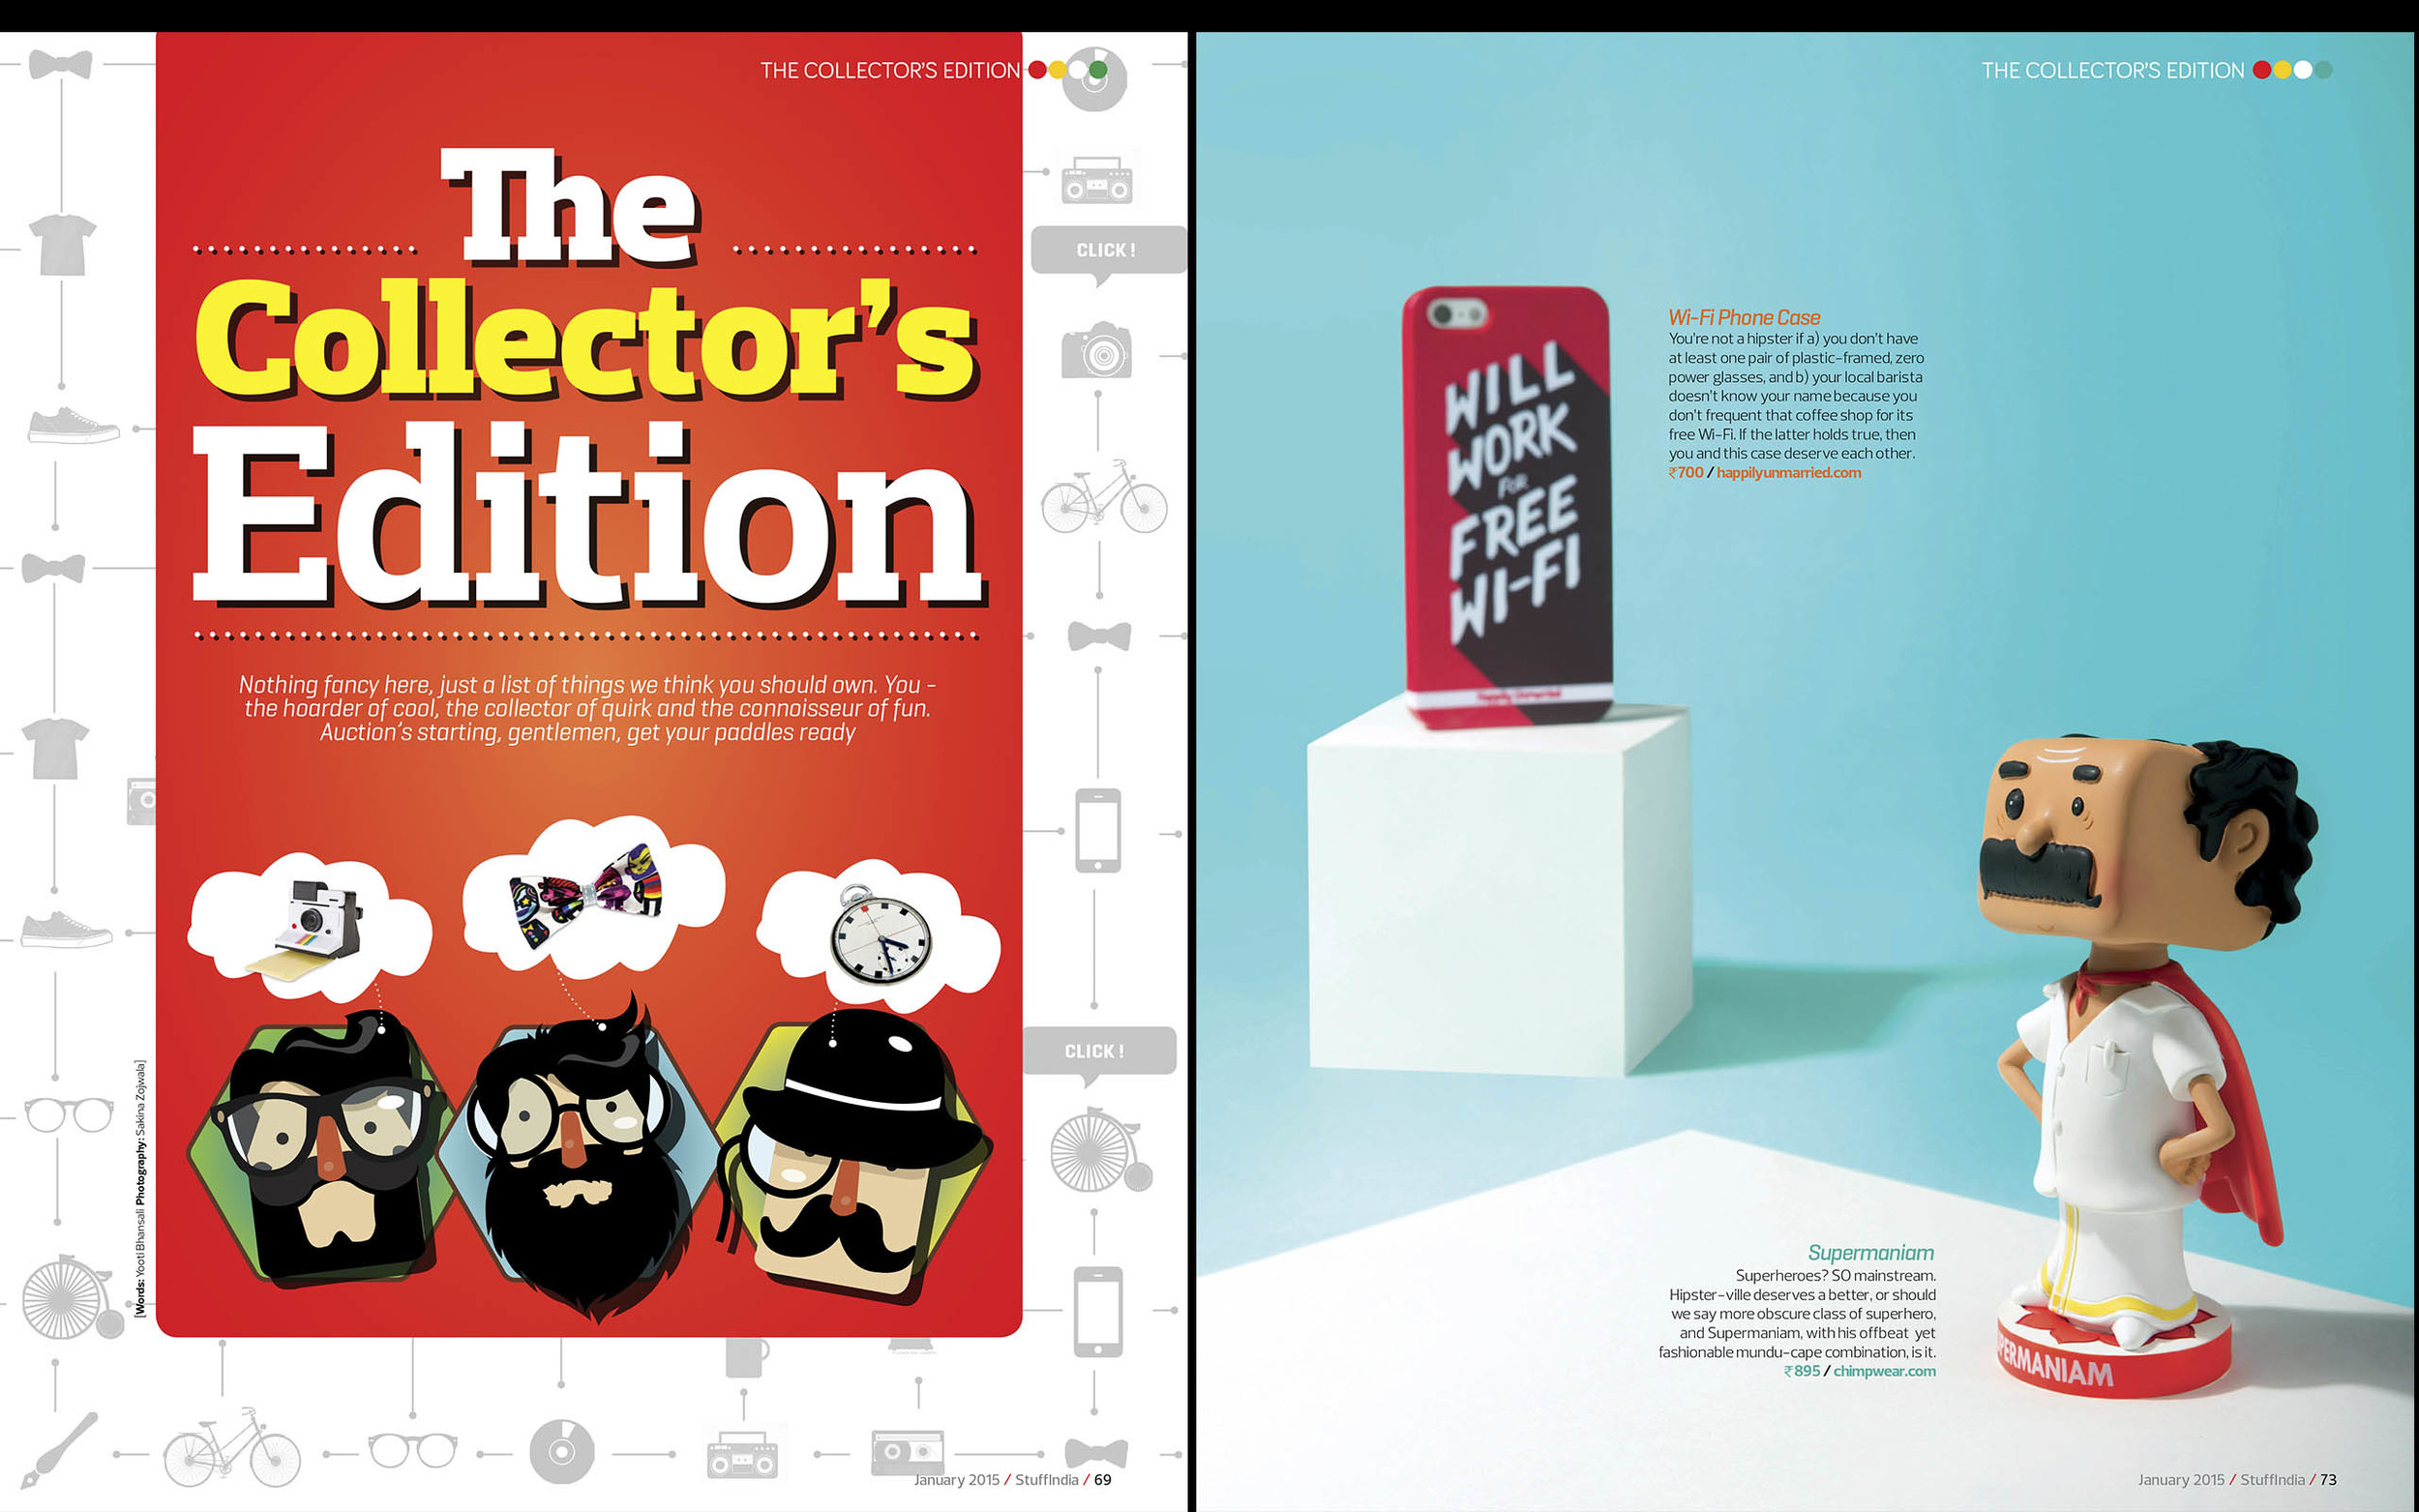 Stuff Magazine- Jan'15 issue